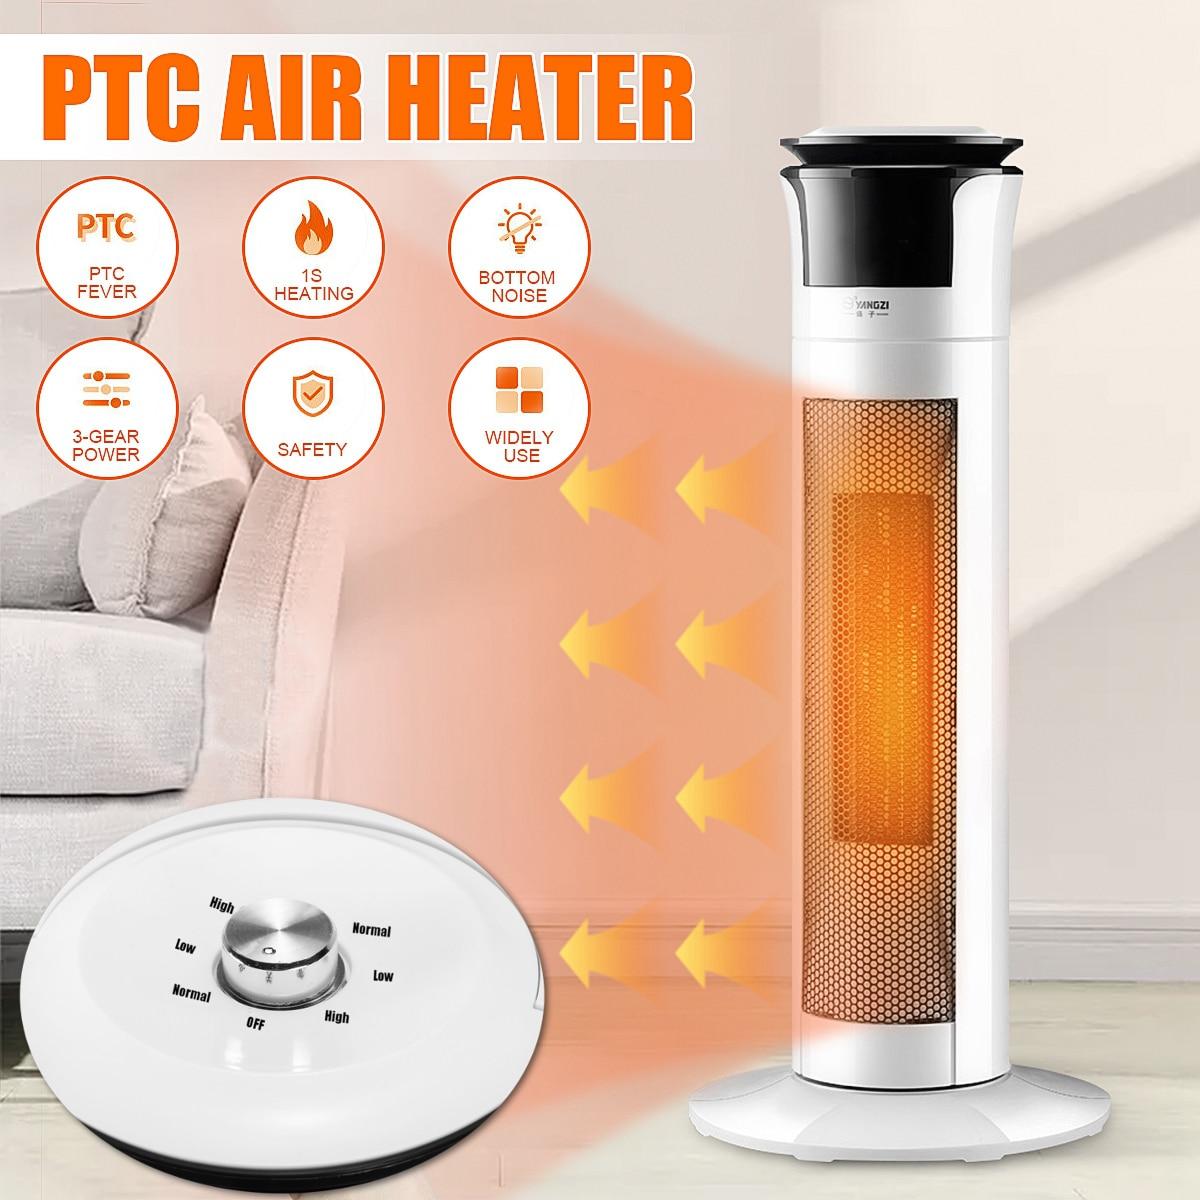 220V 2000W Portable Electric Heater Fan Heater Desktop Household Wall Handy Heating Stove Radiator Warmer Machine For Winter